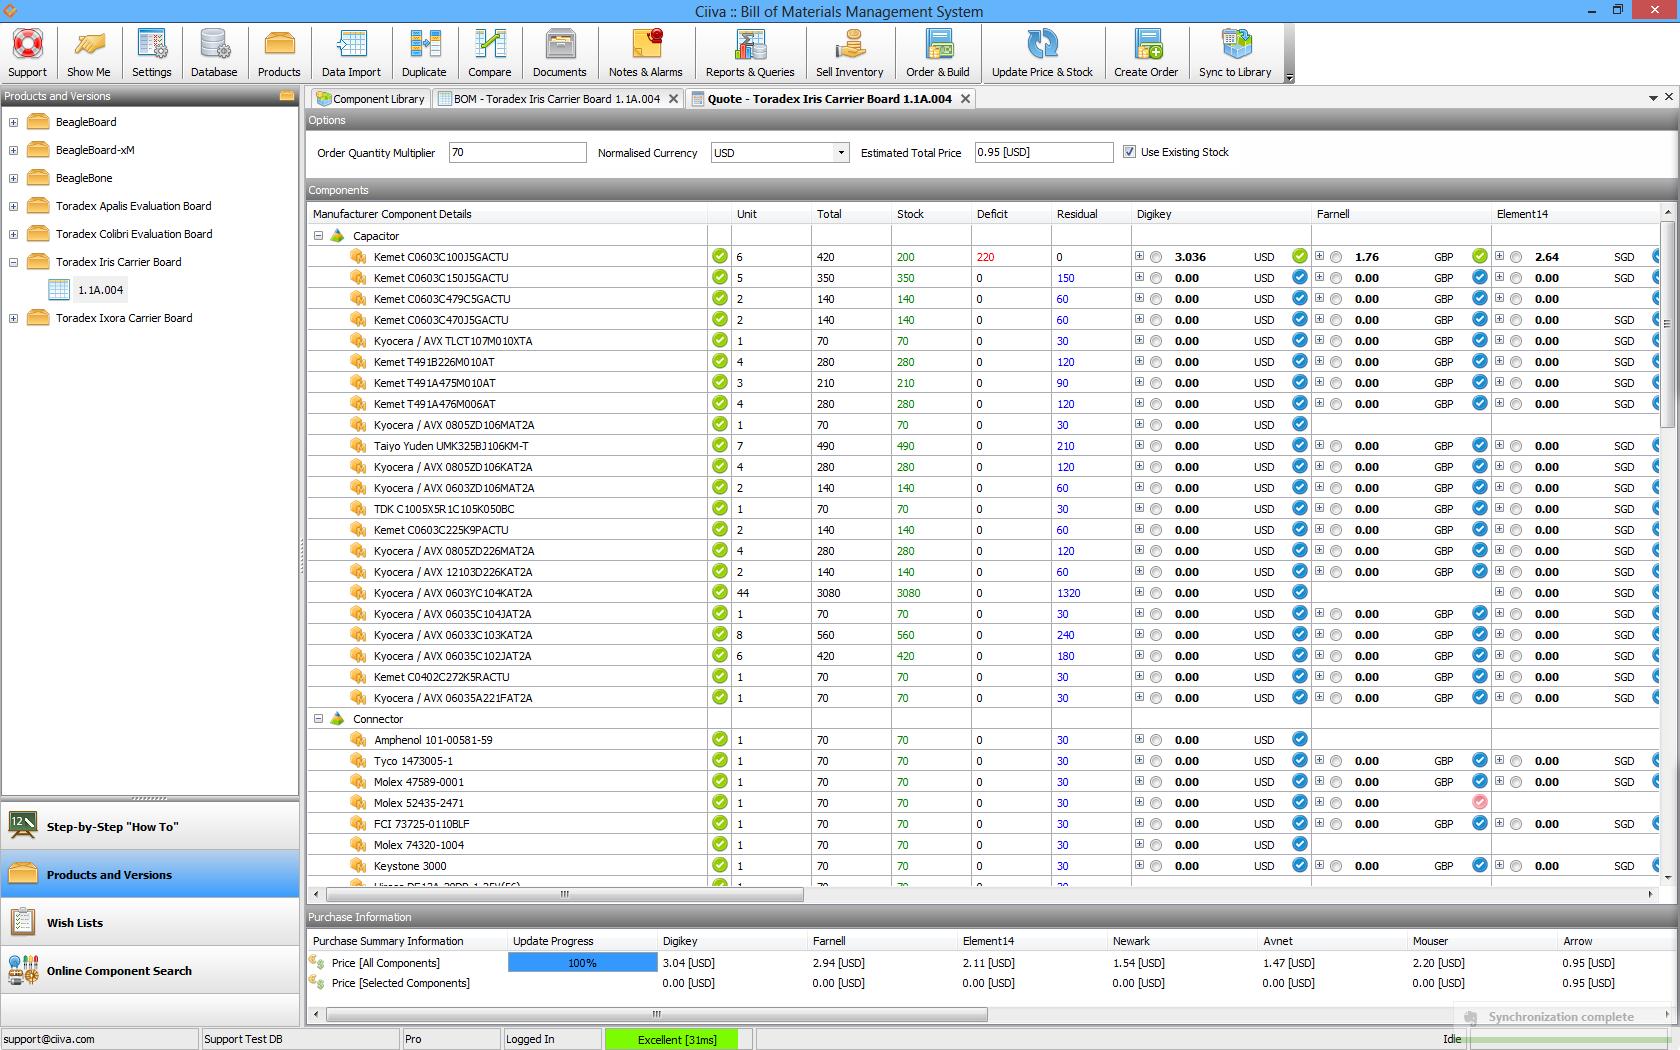 bill of materials bom management software screenshots ciiva